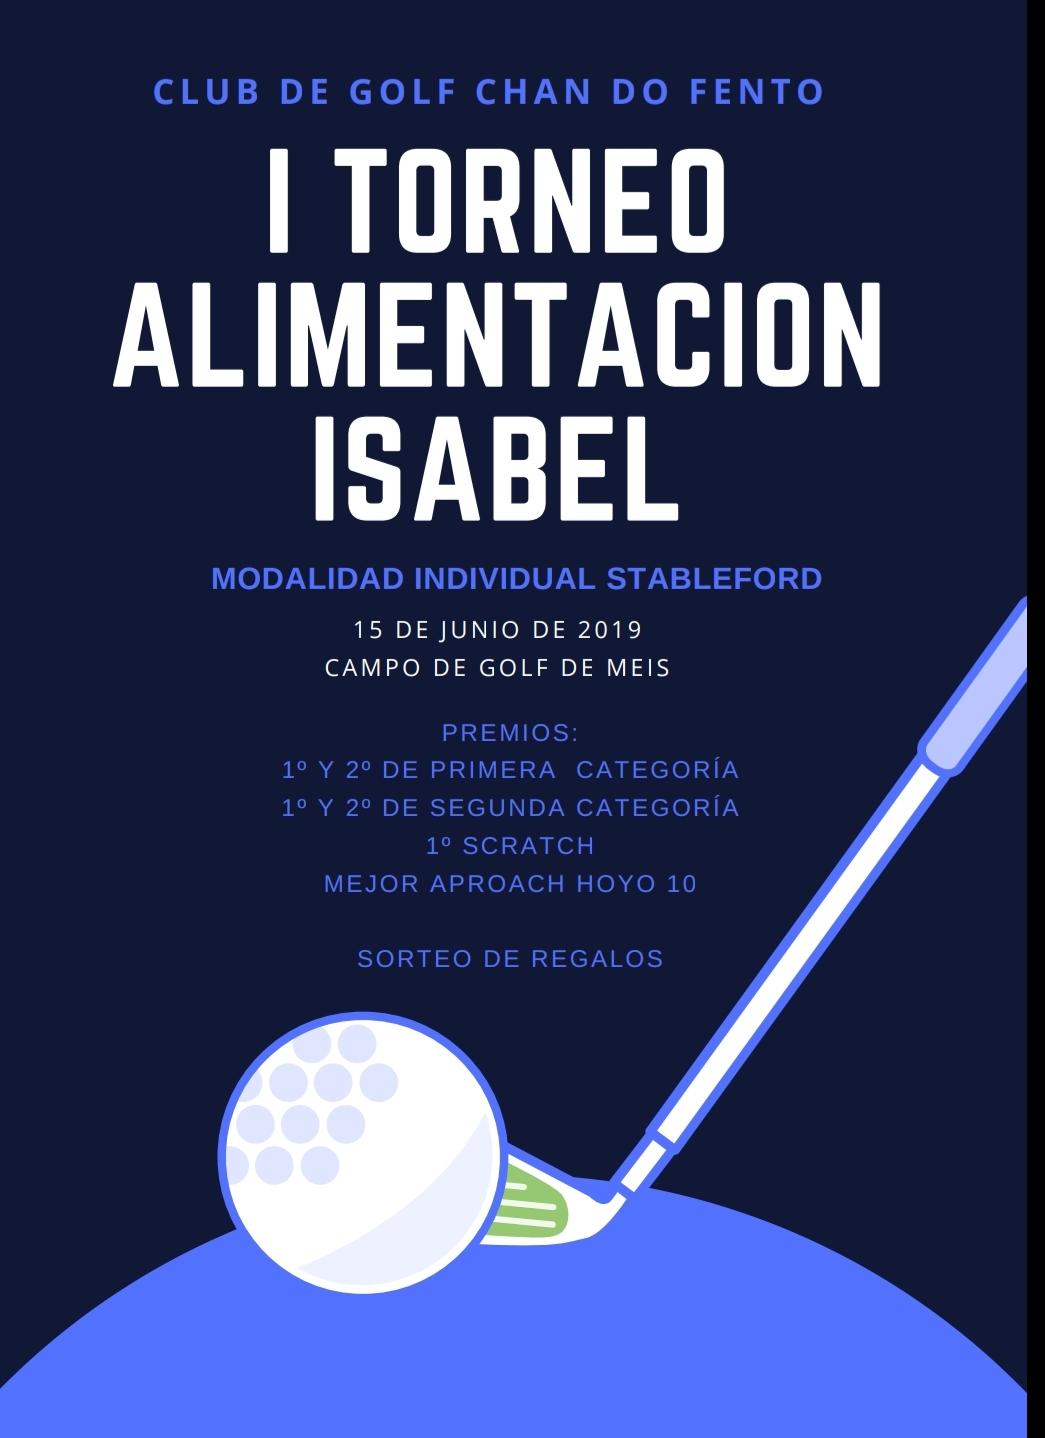 I TORNEO ALIMENTACIÓN ISABEL